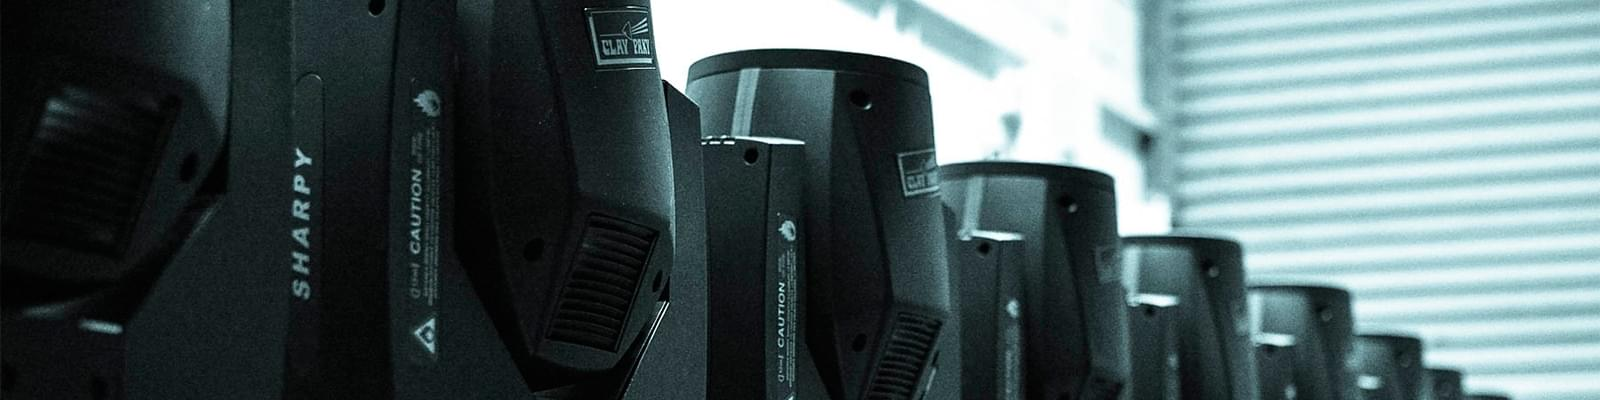 Projektor-3